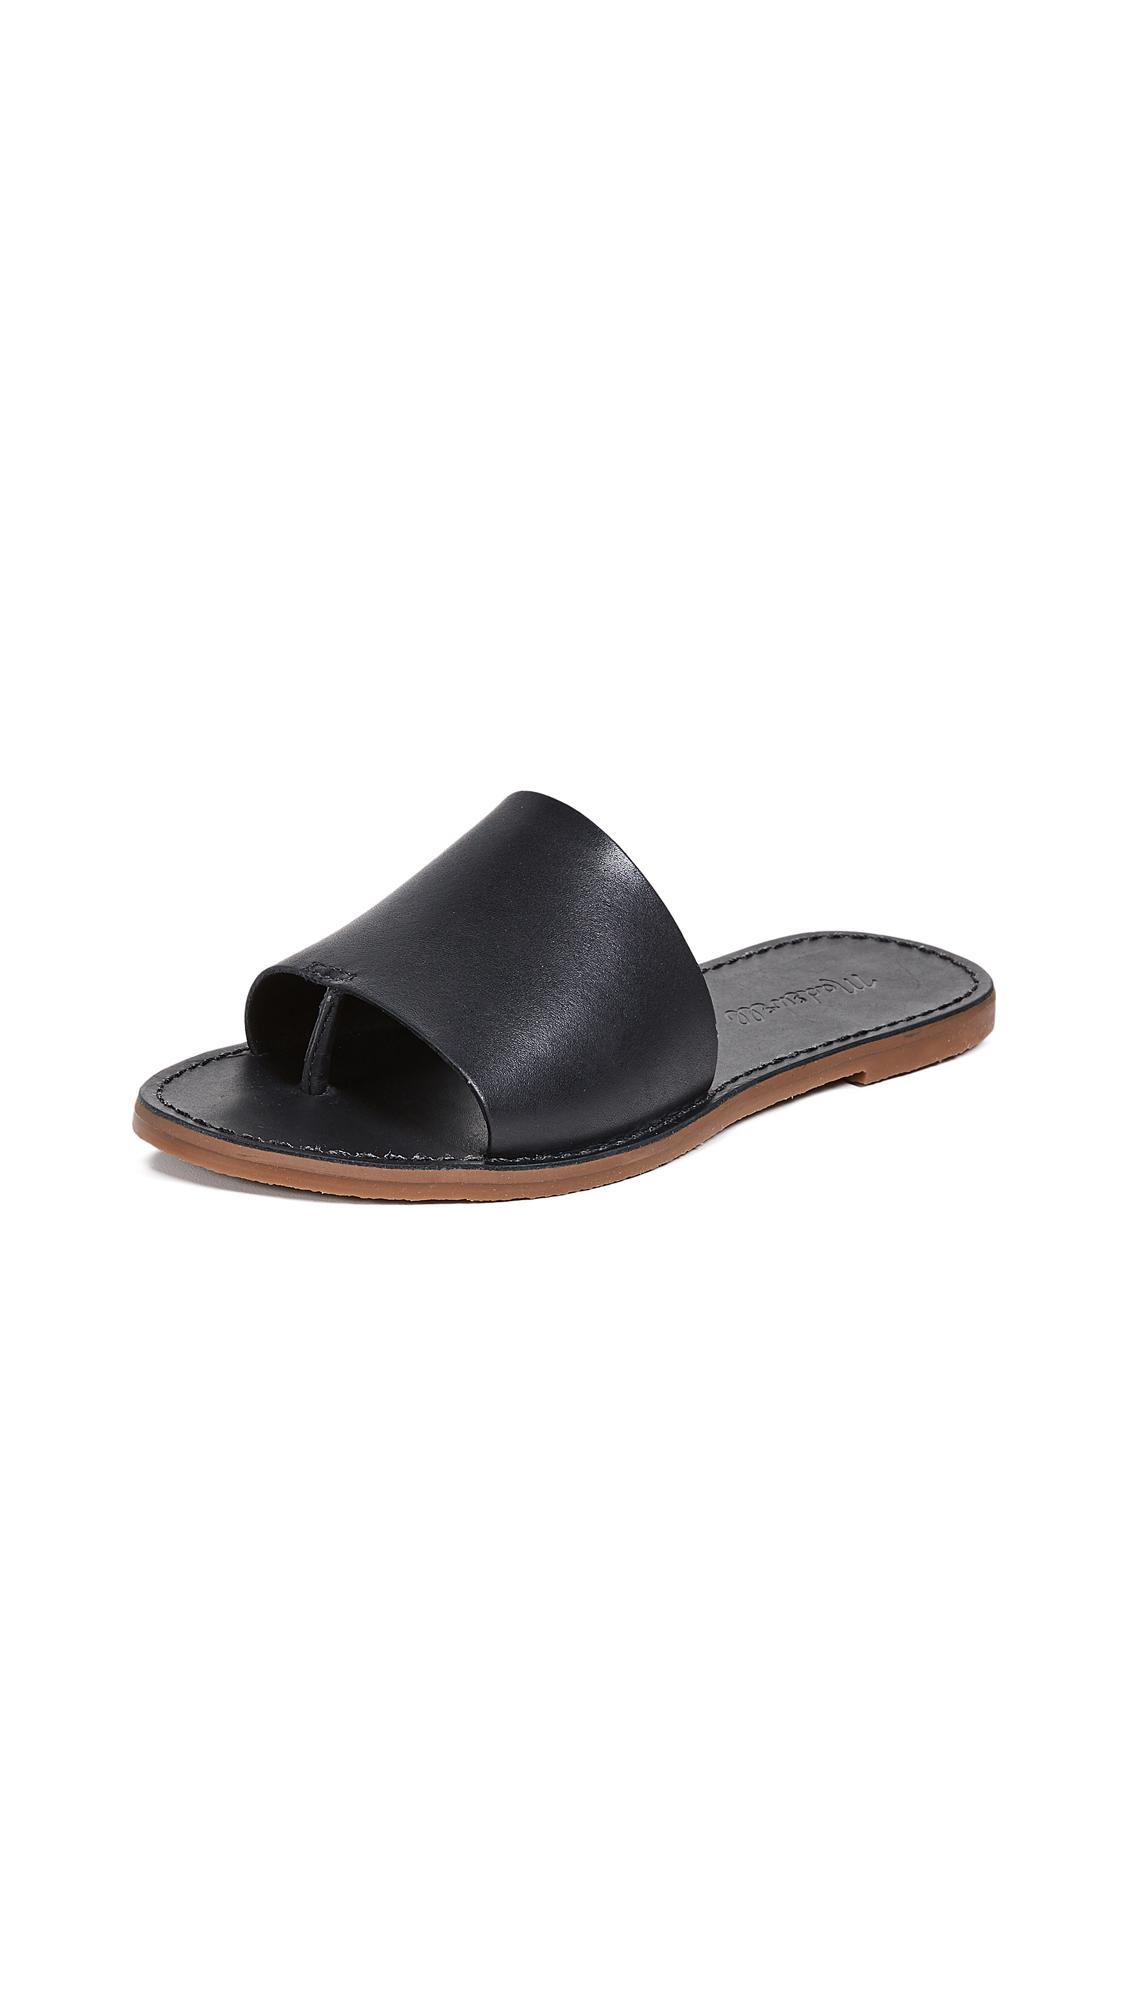 Buy Madewell The Boardwalk Post Slide Sandals online, shop Madewell